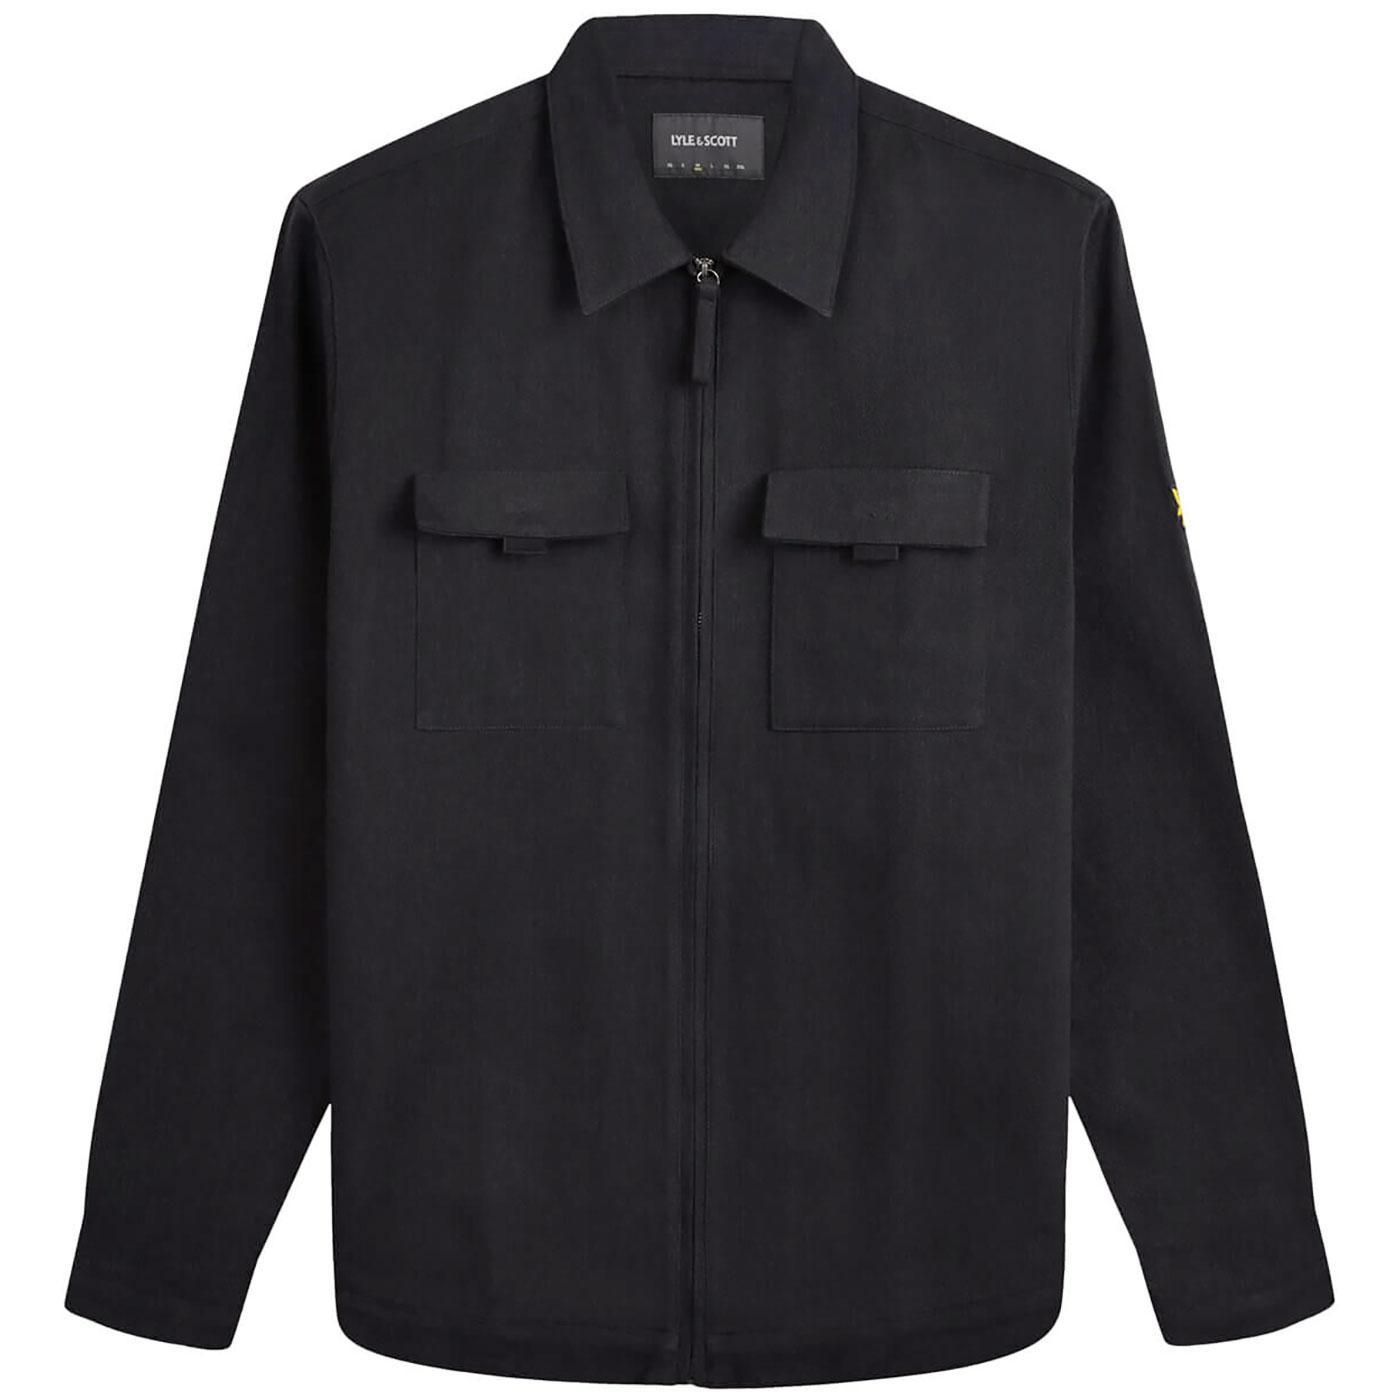 LYLE & SCOTT Zip Through Cotton Twill Overshirt B